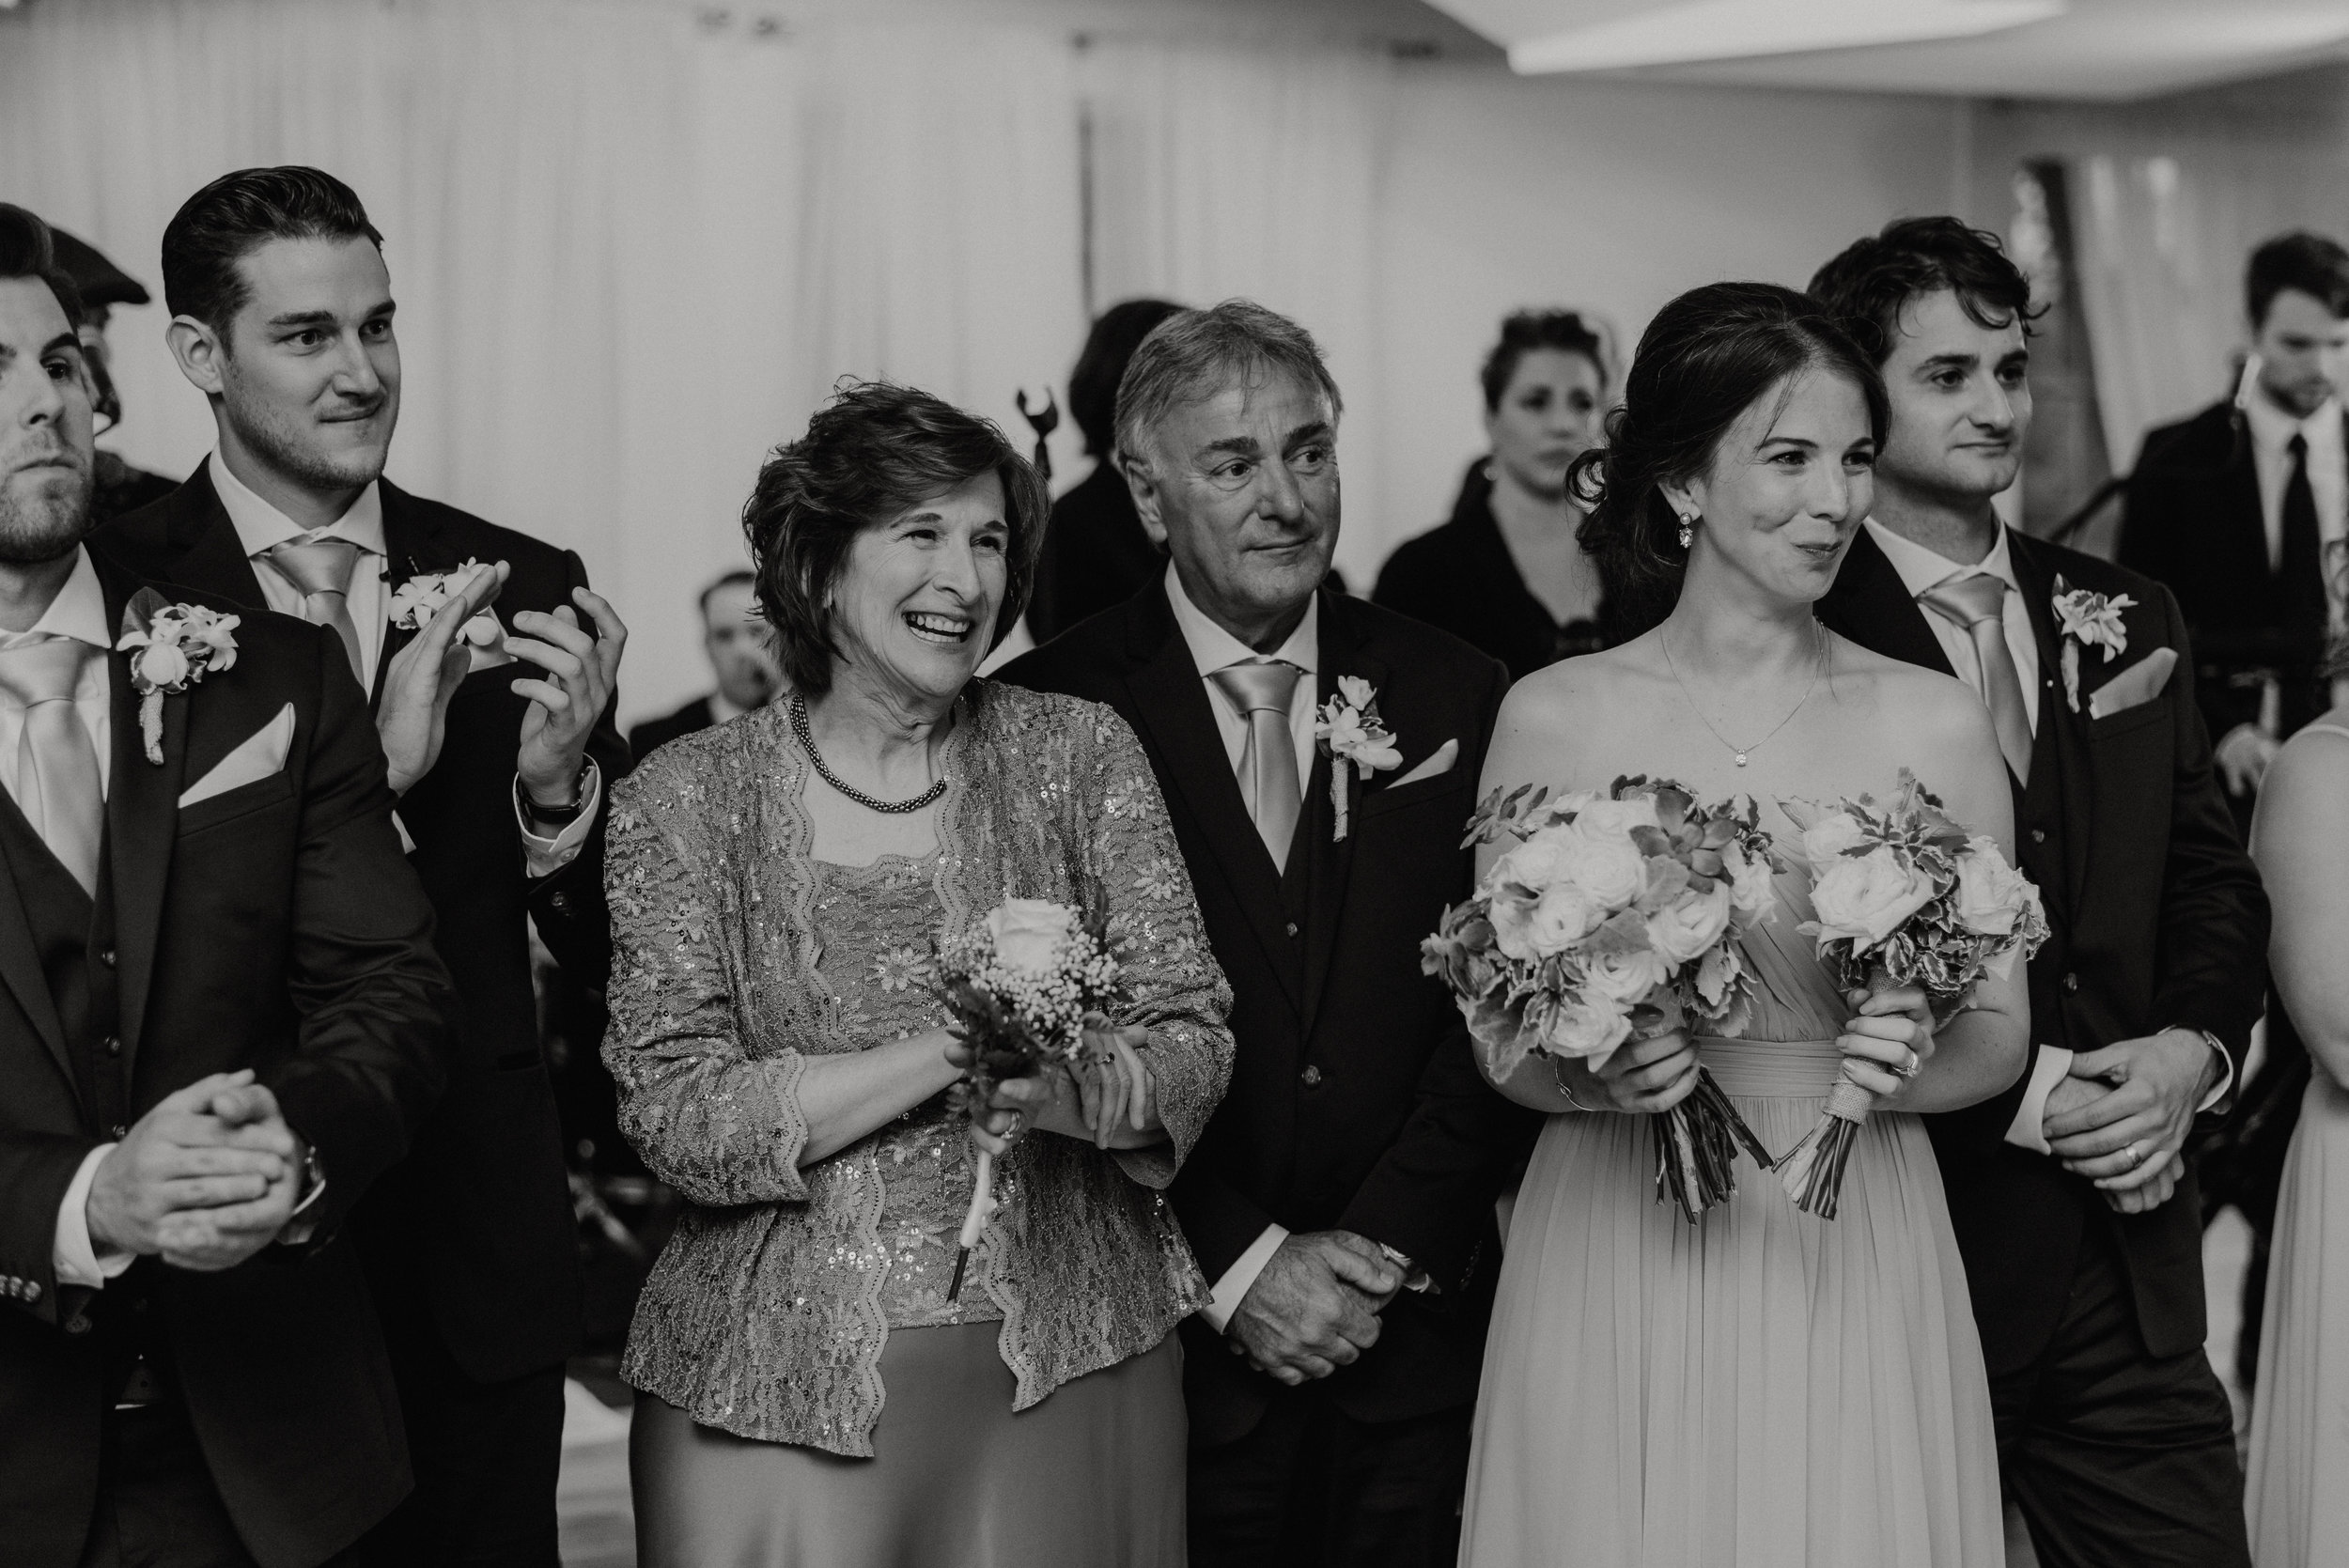 old_daley_on_crooked_lake_wedding_-89.jpg